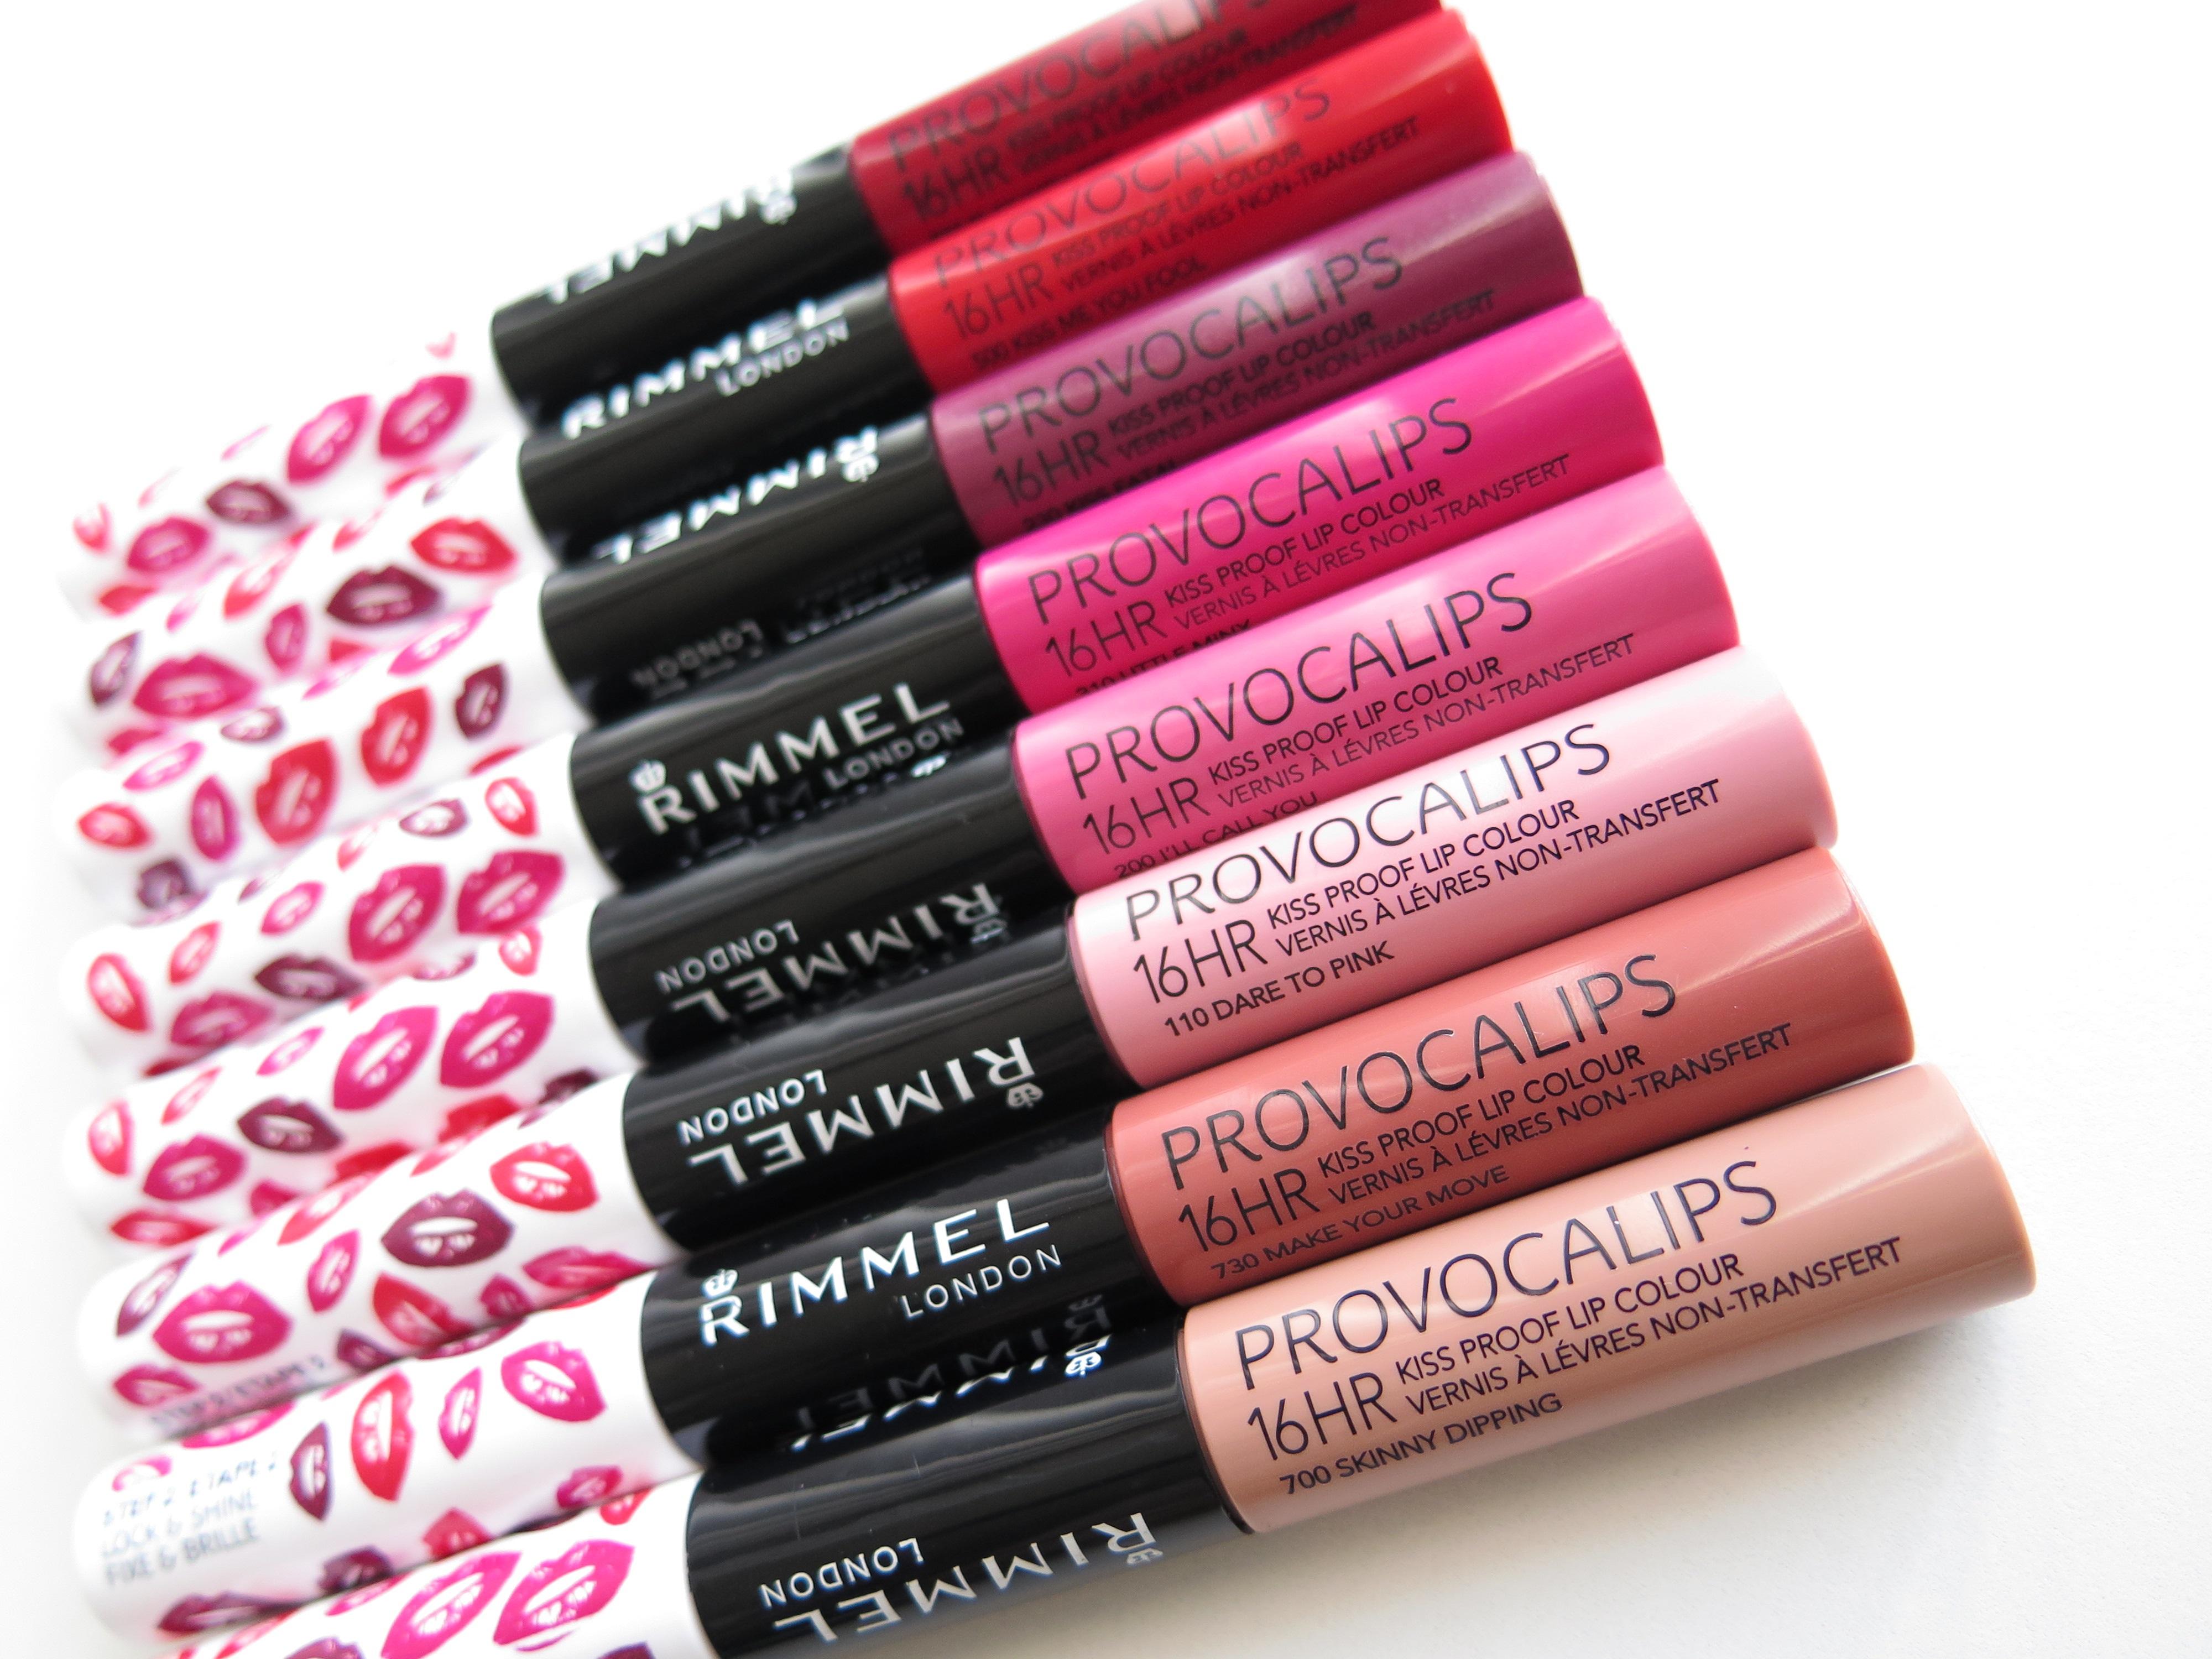 Rimmel London Provocalips 16 Hour Kiss Proof Lip Colours Review